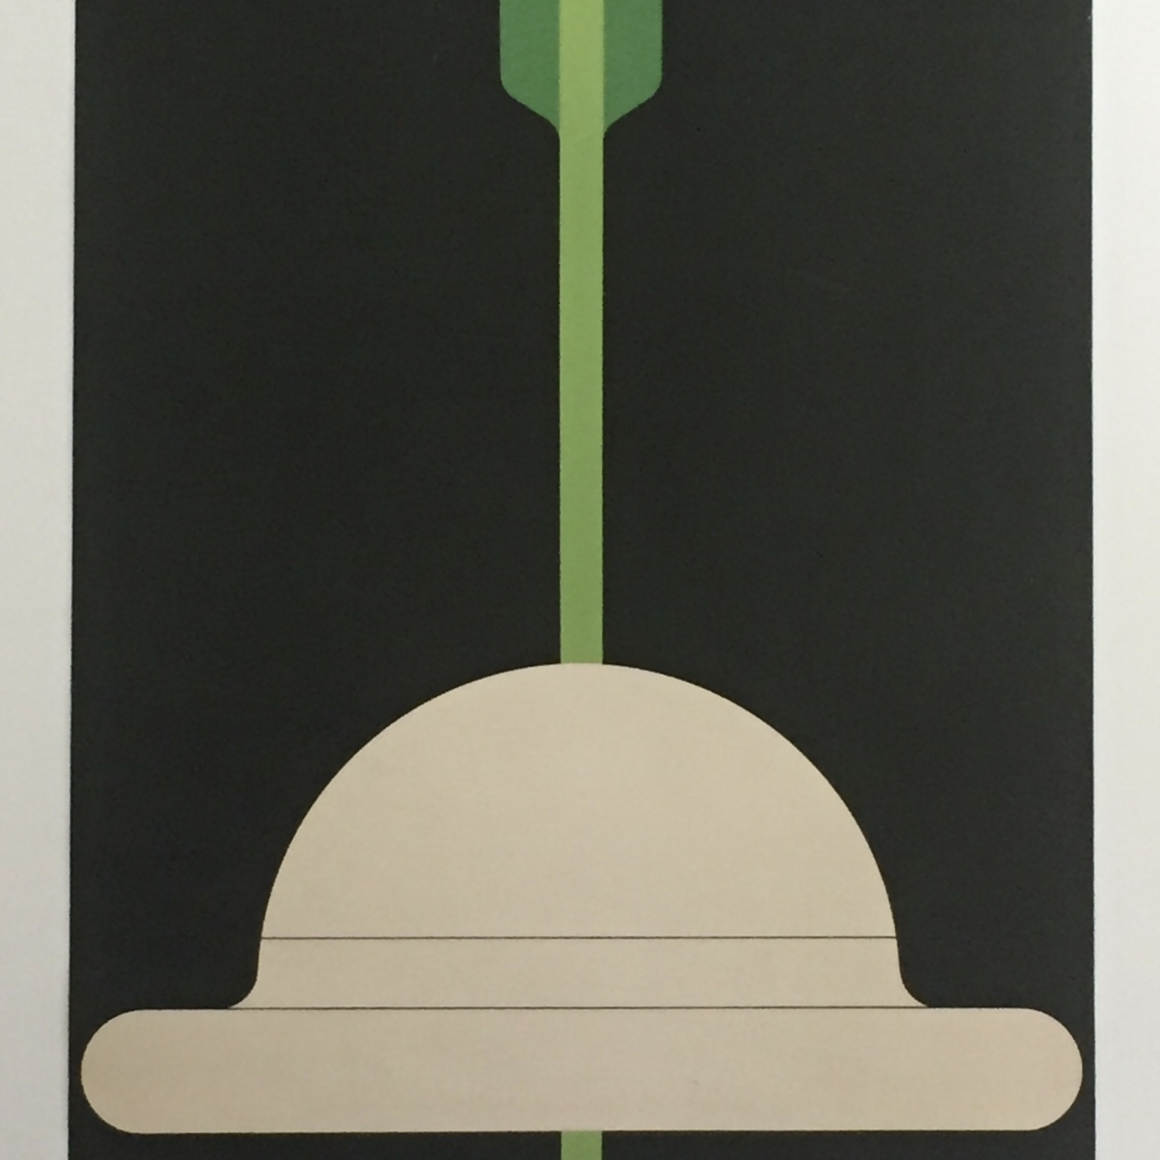 """Day of Solidarity with Zimbabwe"", OSPAAAL, Faustino Pérez, 1970."